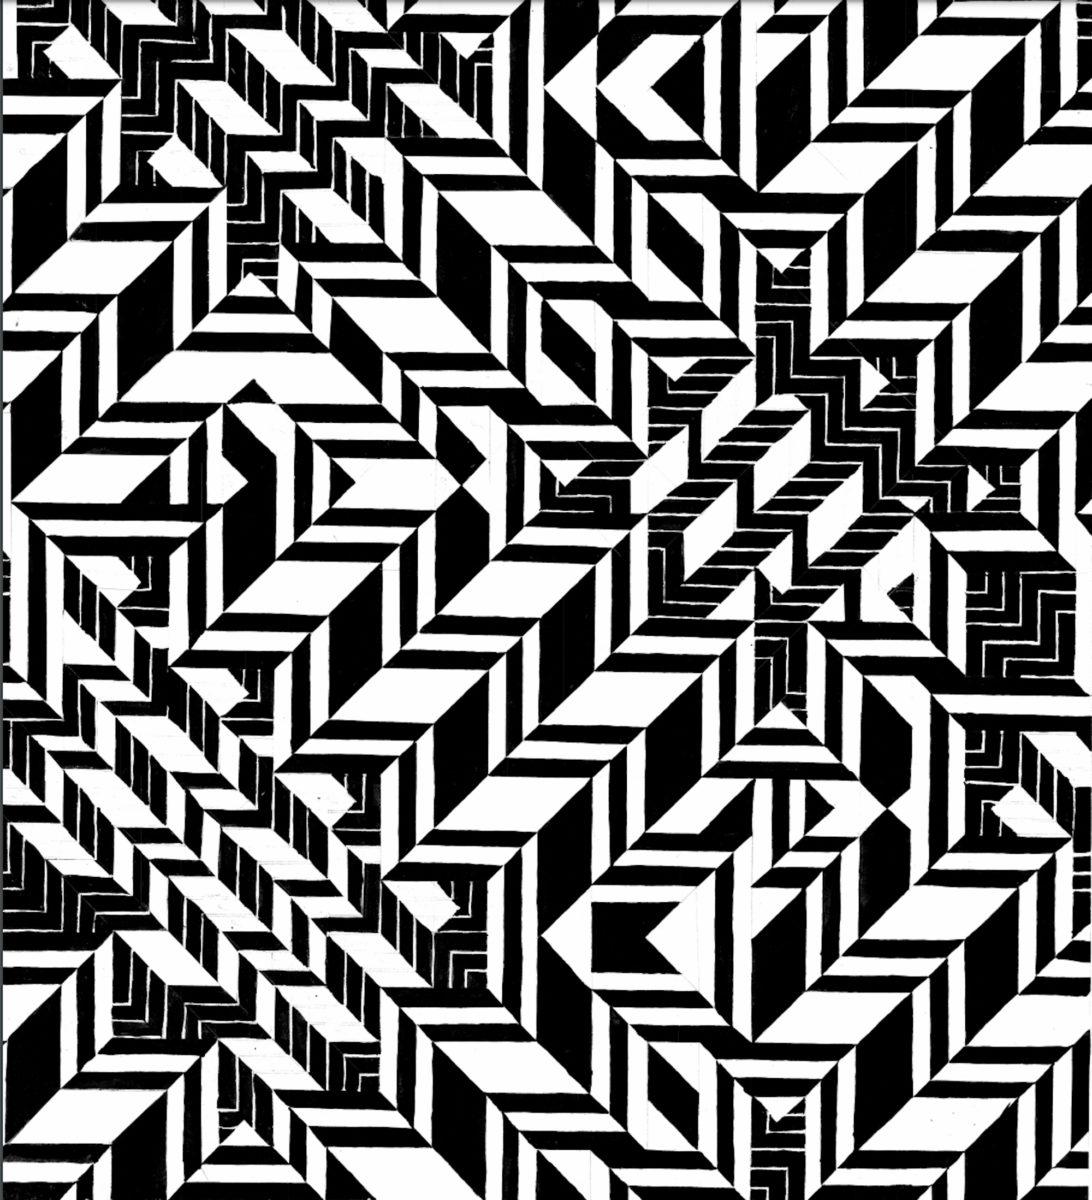 'Mathematics' (1974) (2) [private collection]